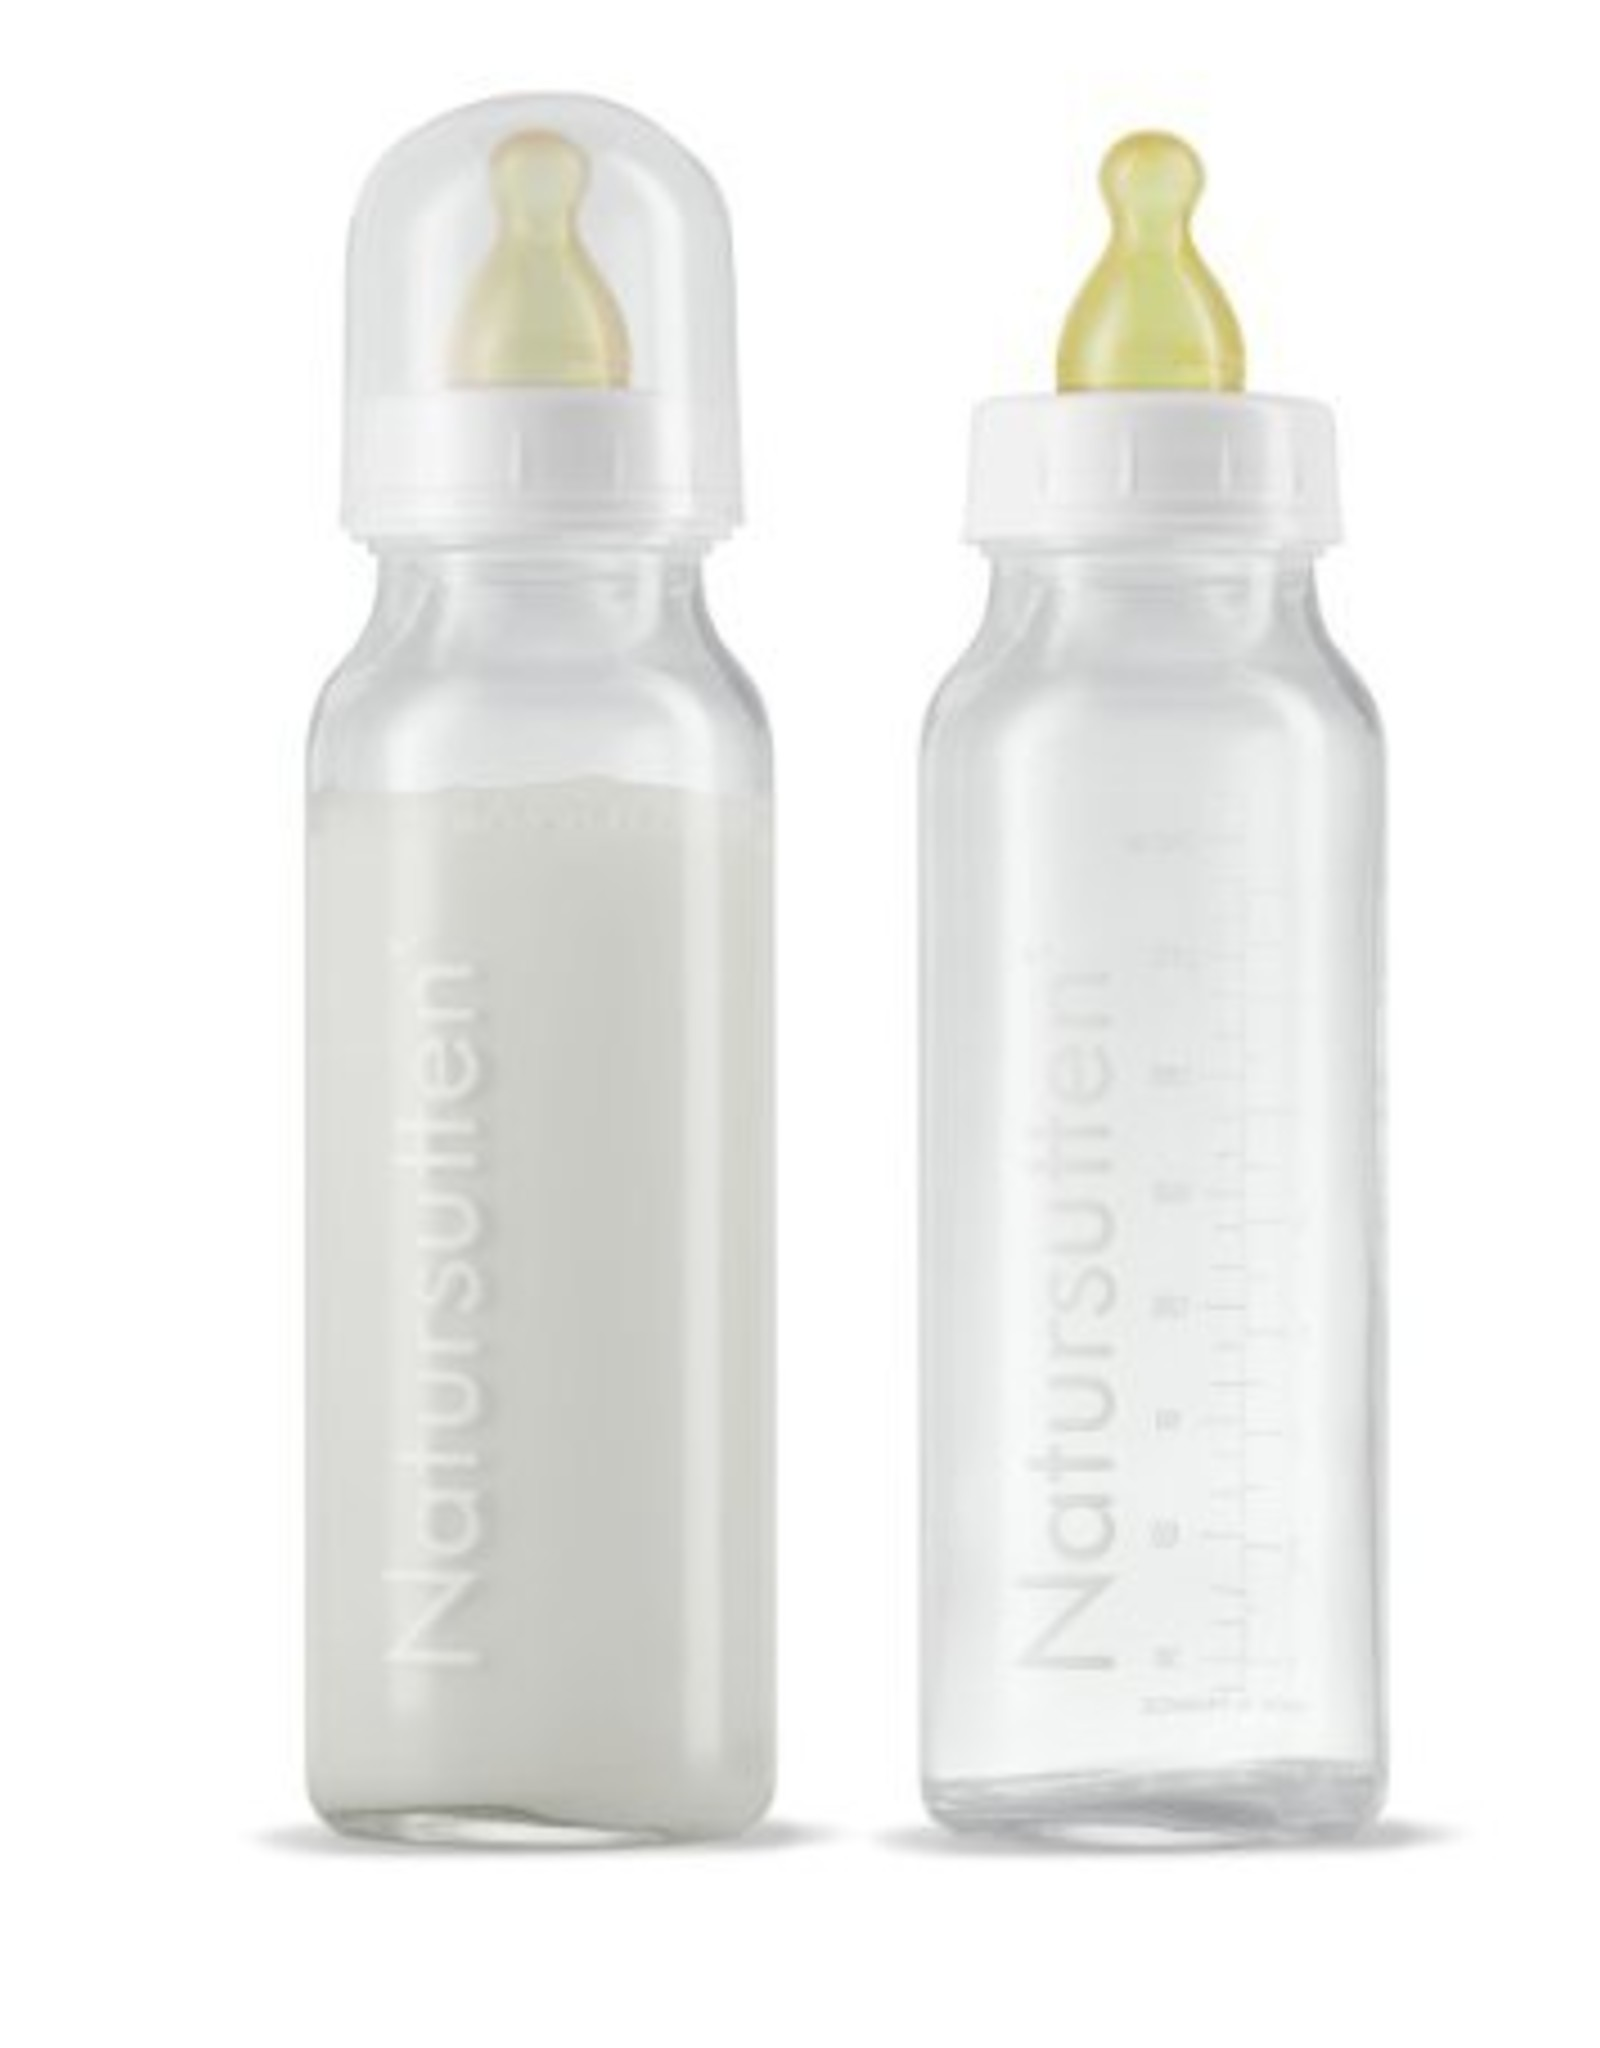 Glass Baby Bottle- 2 pack